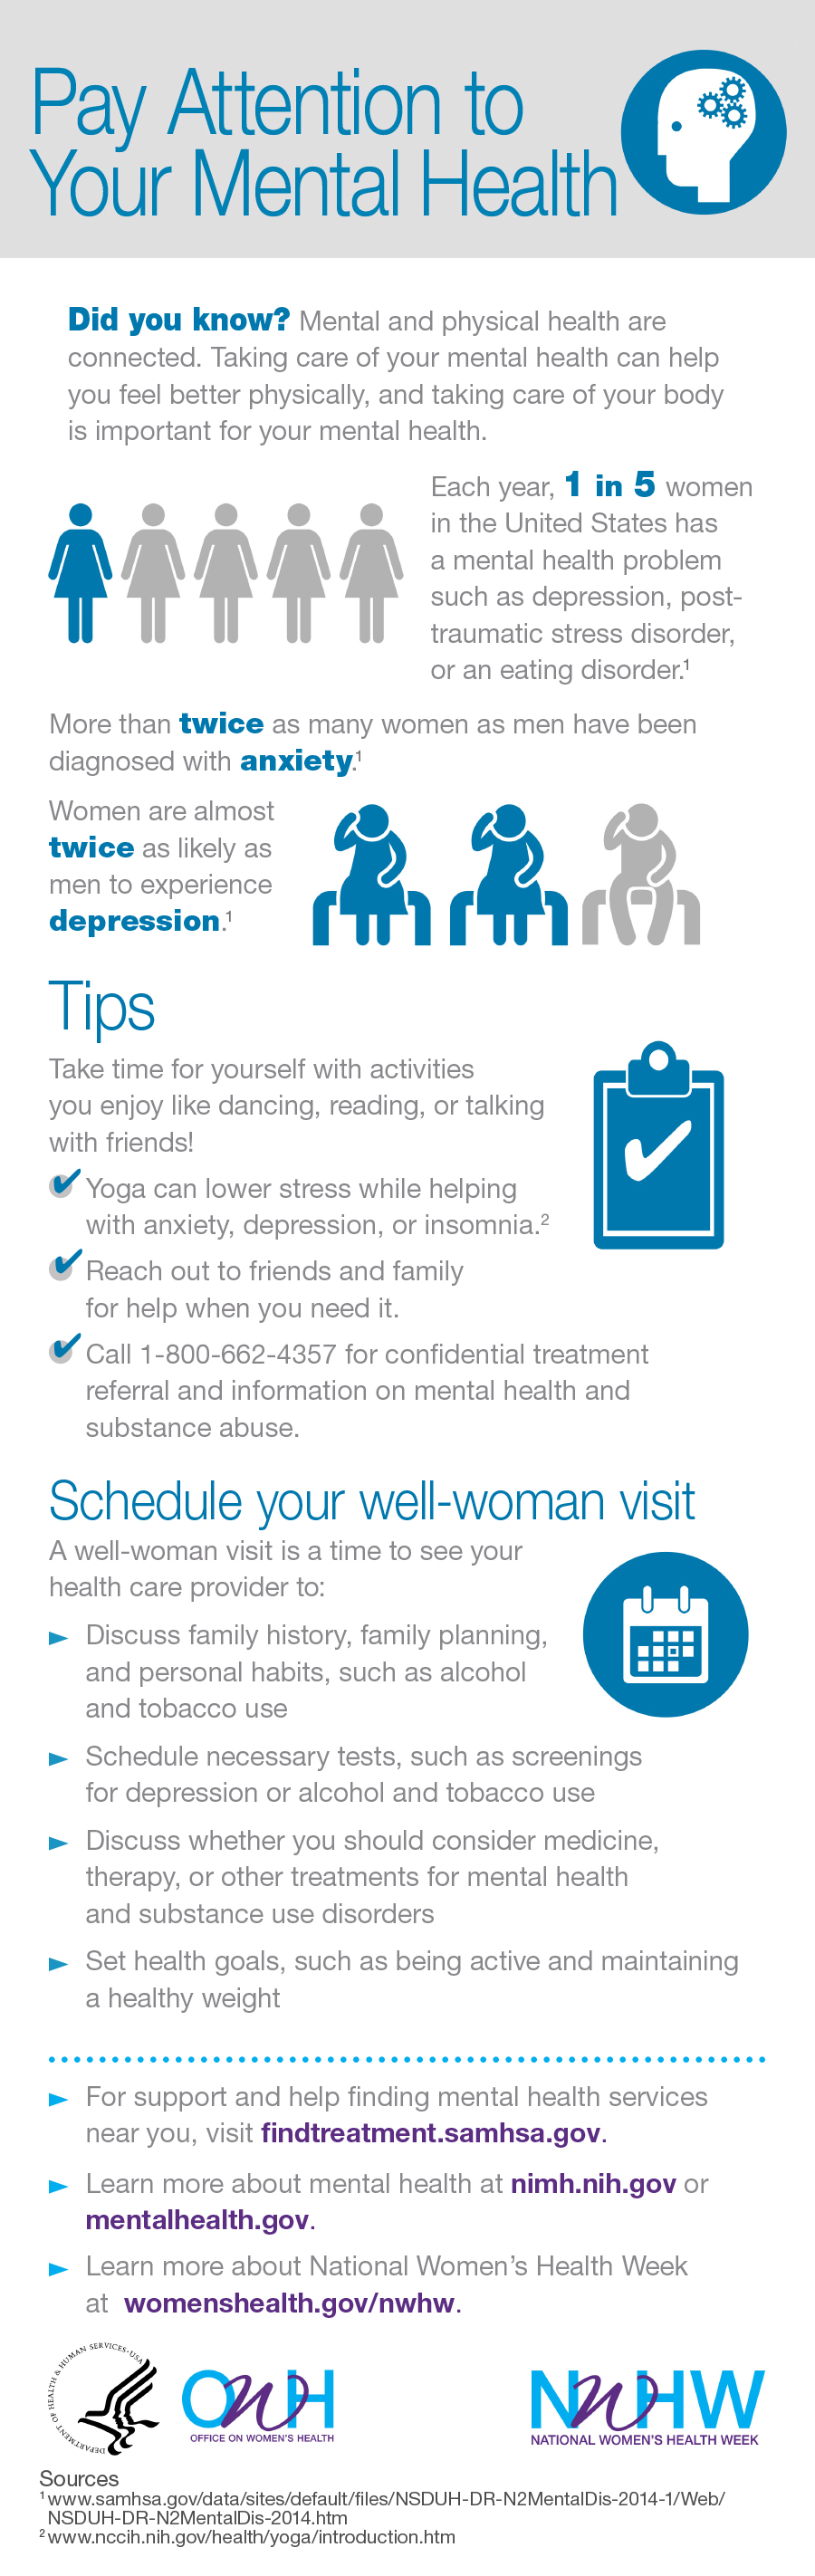 nwhw_infographic-mental-health_0.jpg